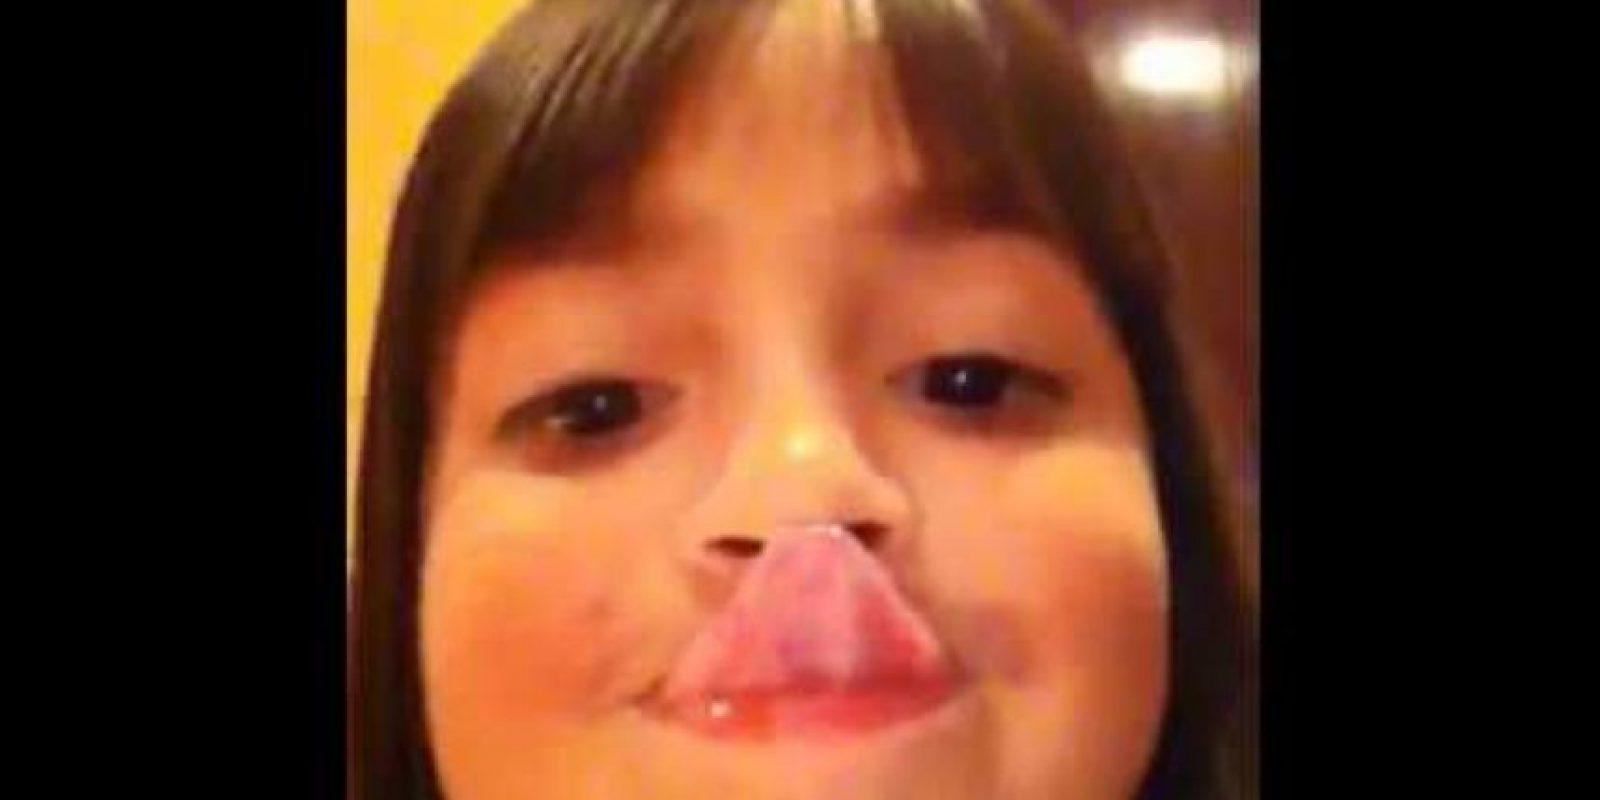 Tocar tu nariz o barbilla con la lengua. Foto:Vía Youtube